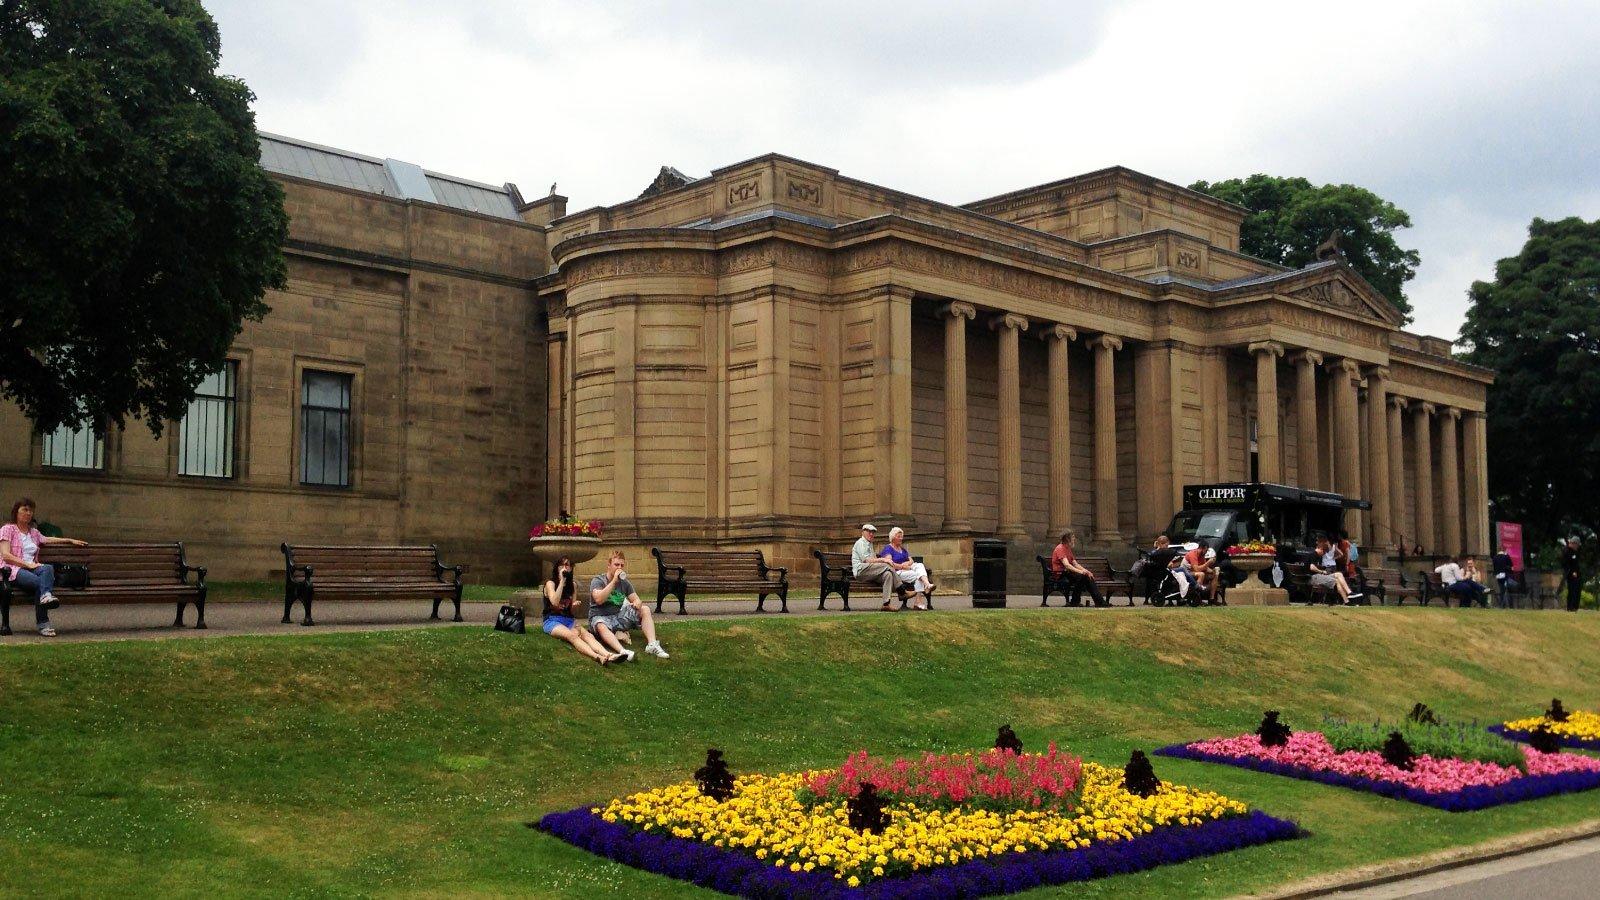 Weston Park Museum, Sheffield